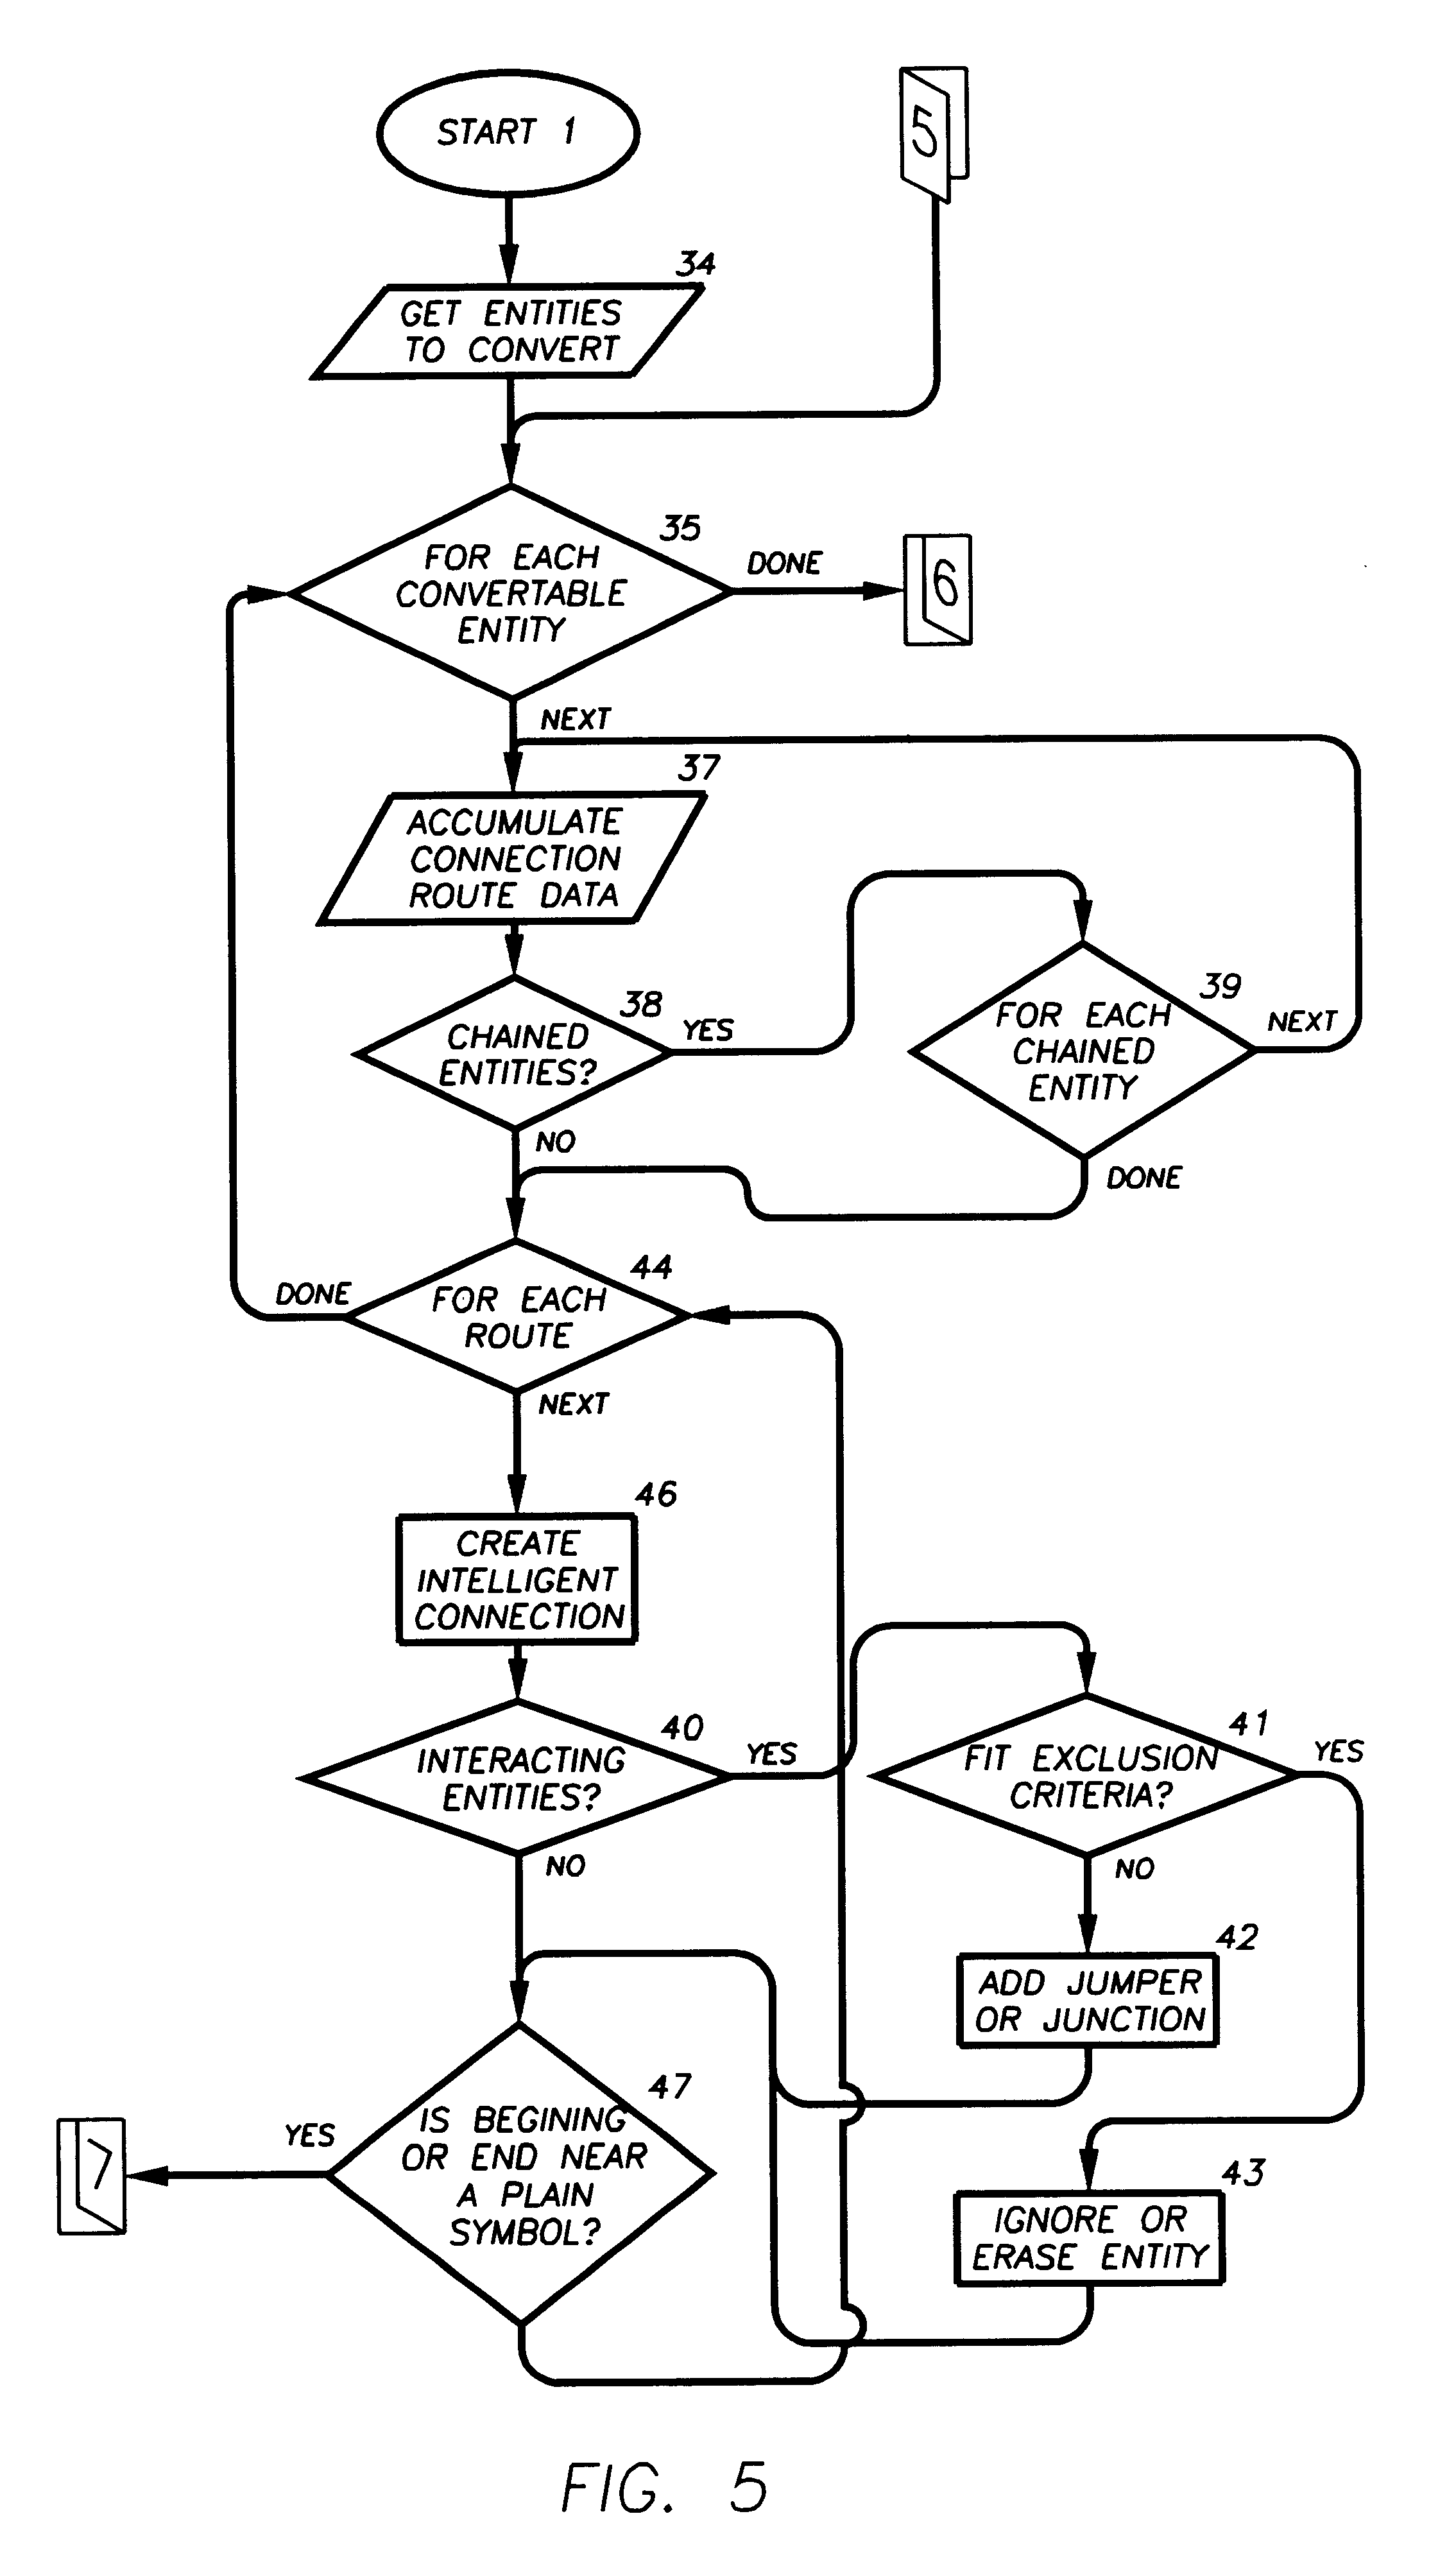 schematic diagram symbols hvac images method of enhancing putergenerated symbols on computer wiring symbols